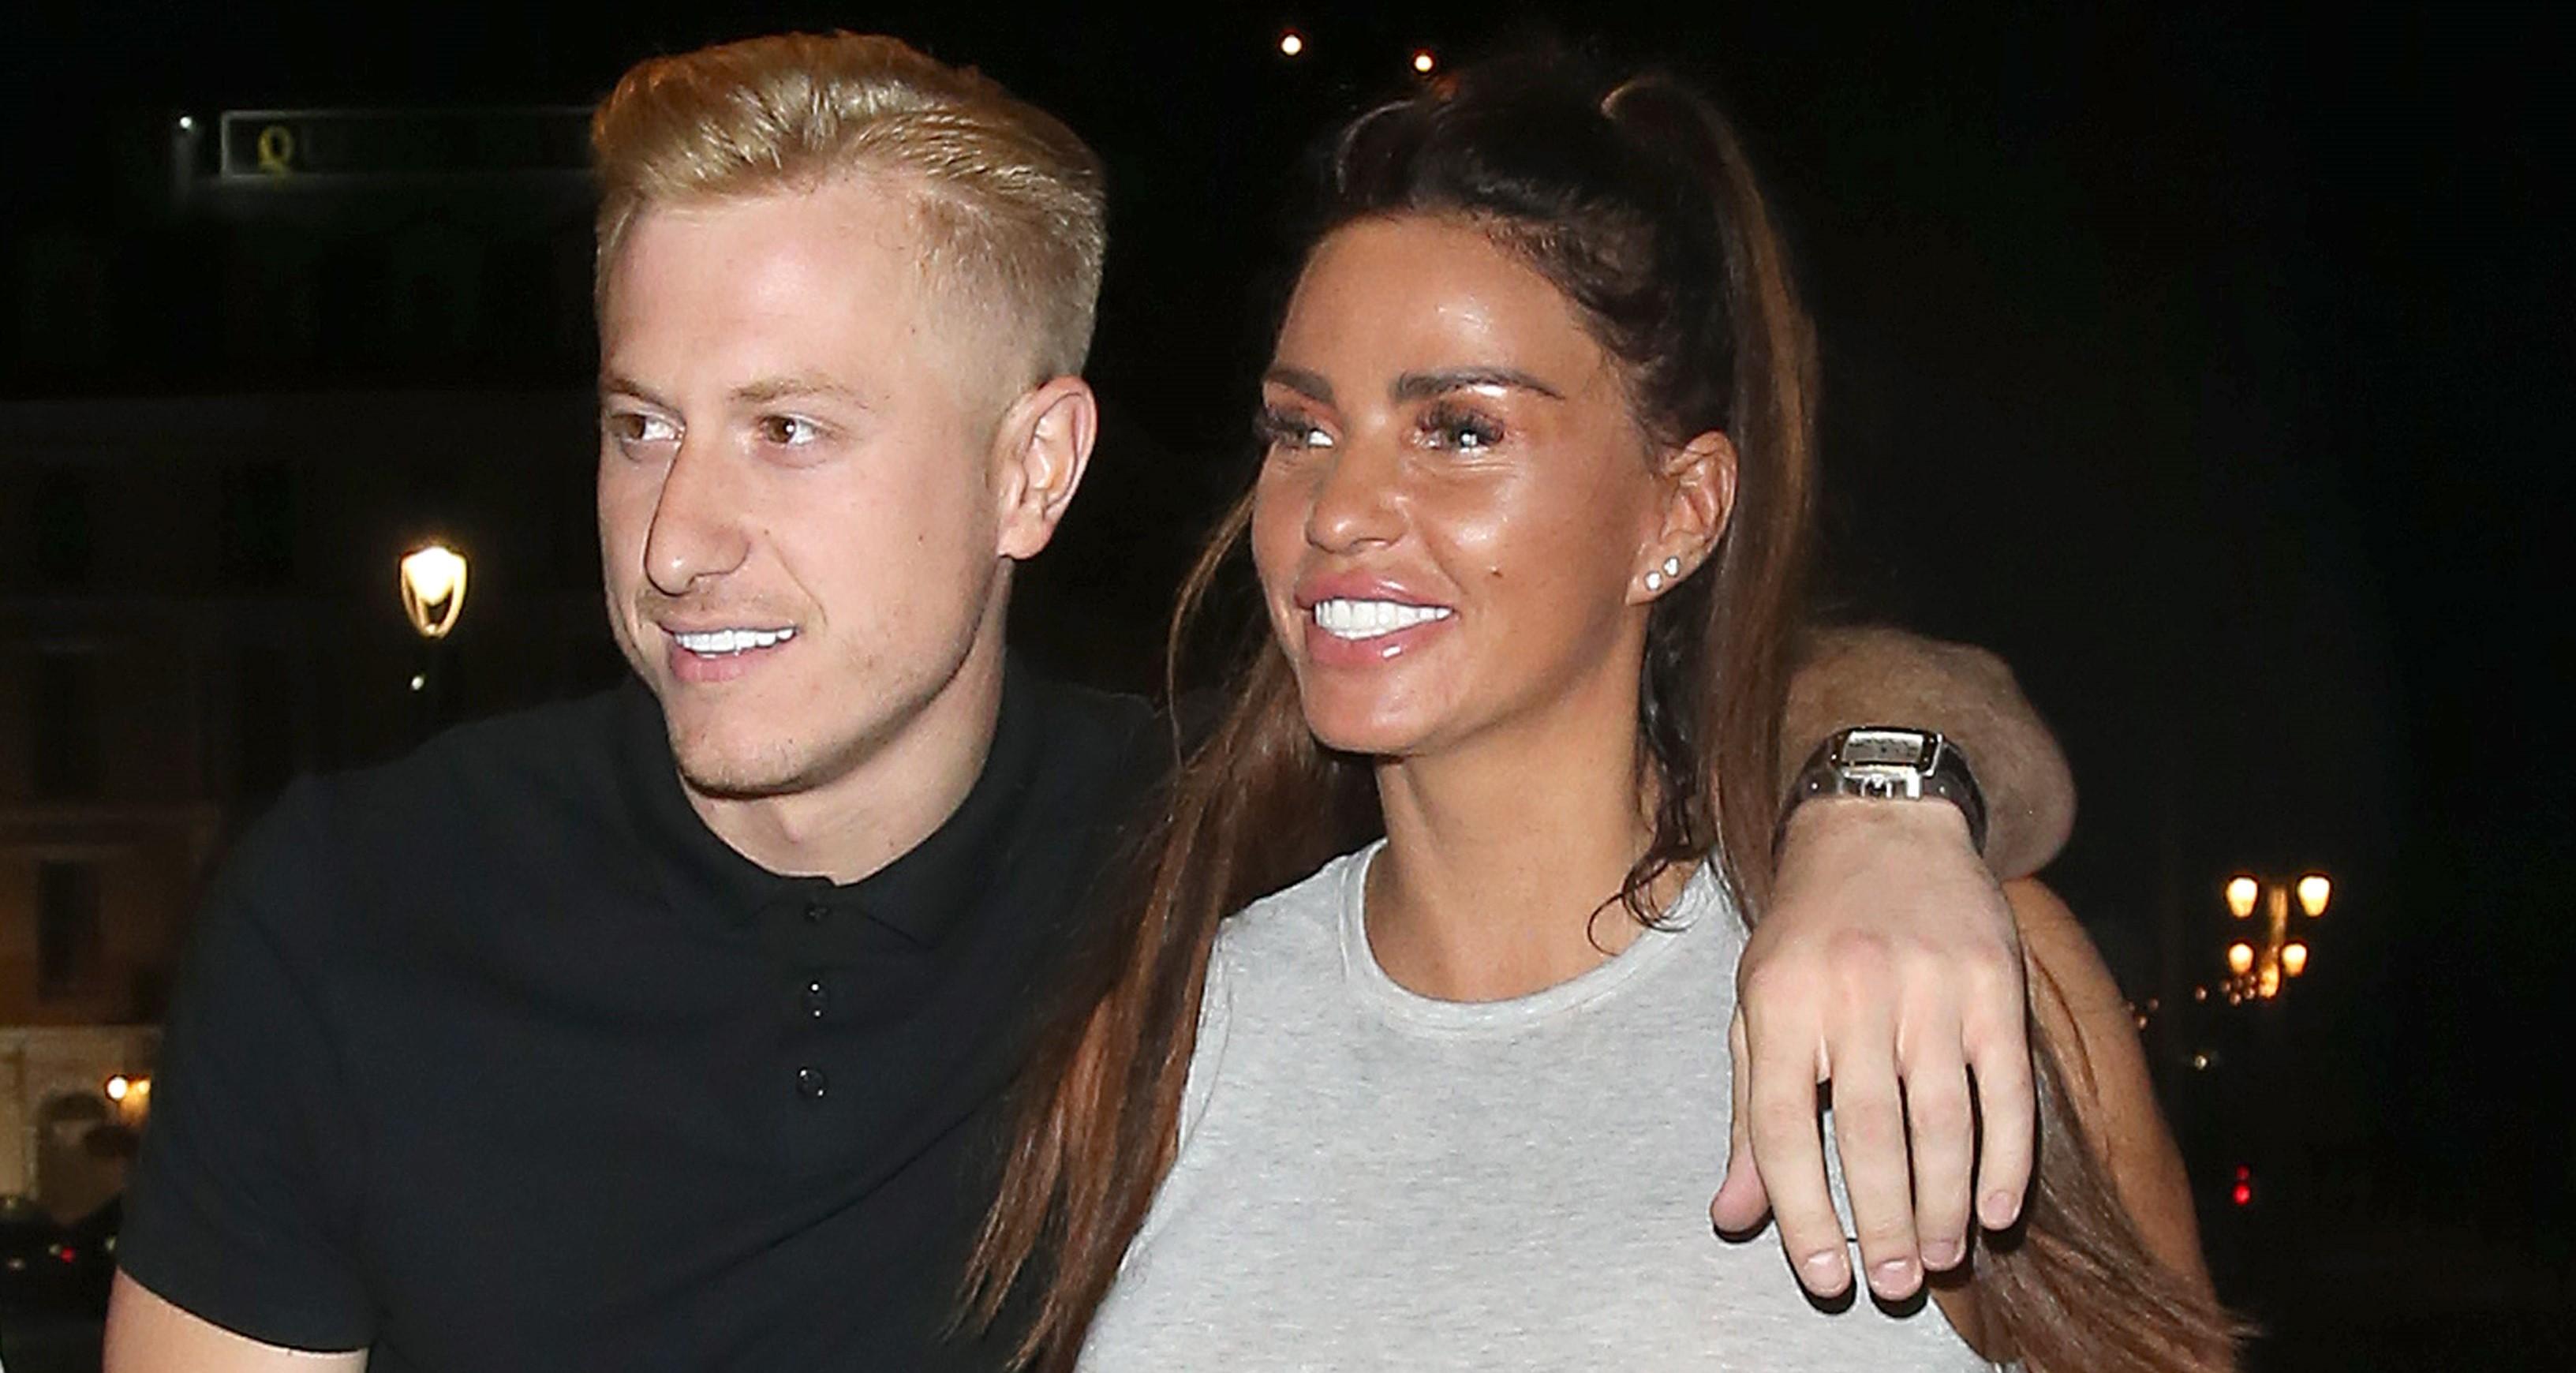 Katie Price 'demands ex Kris Boyson gives back half of his nose job'